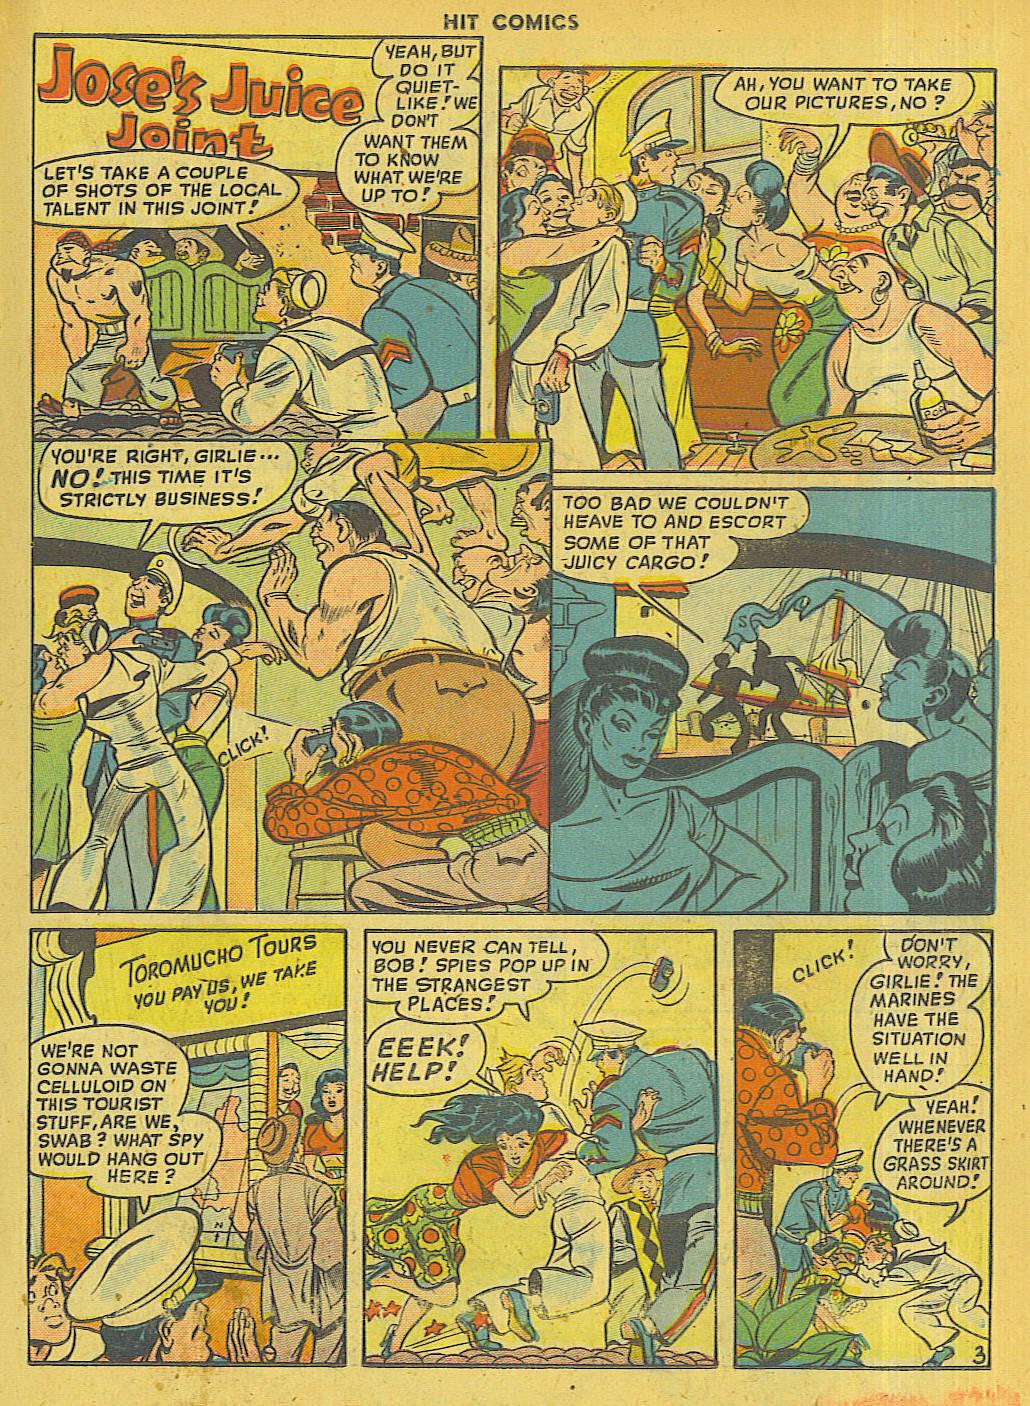 Read online Hit Comics comic -  Issue #56 - 23